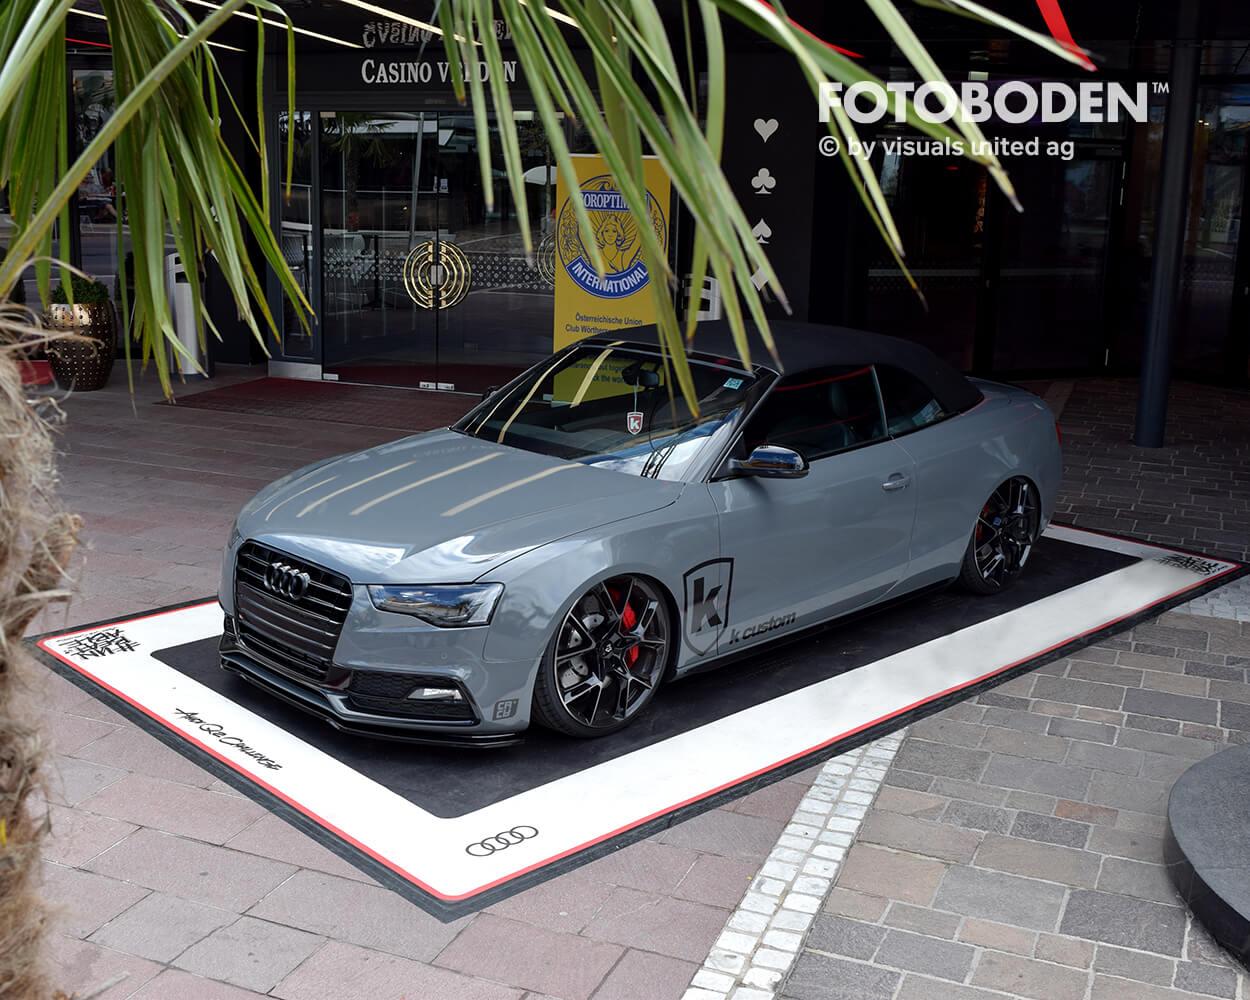 Audi Fotoboden Flooring Fußboden Bodengestaltung Floorminder Bodendruck Werbung Fußbodenwerbung Bodenwerbung Merchandising Advertising Visualmerchandising3